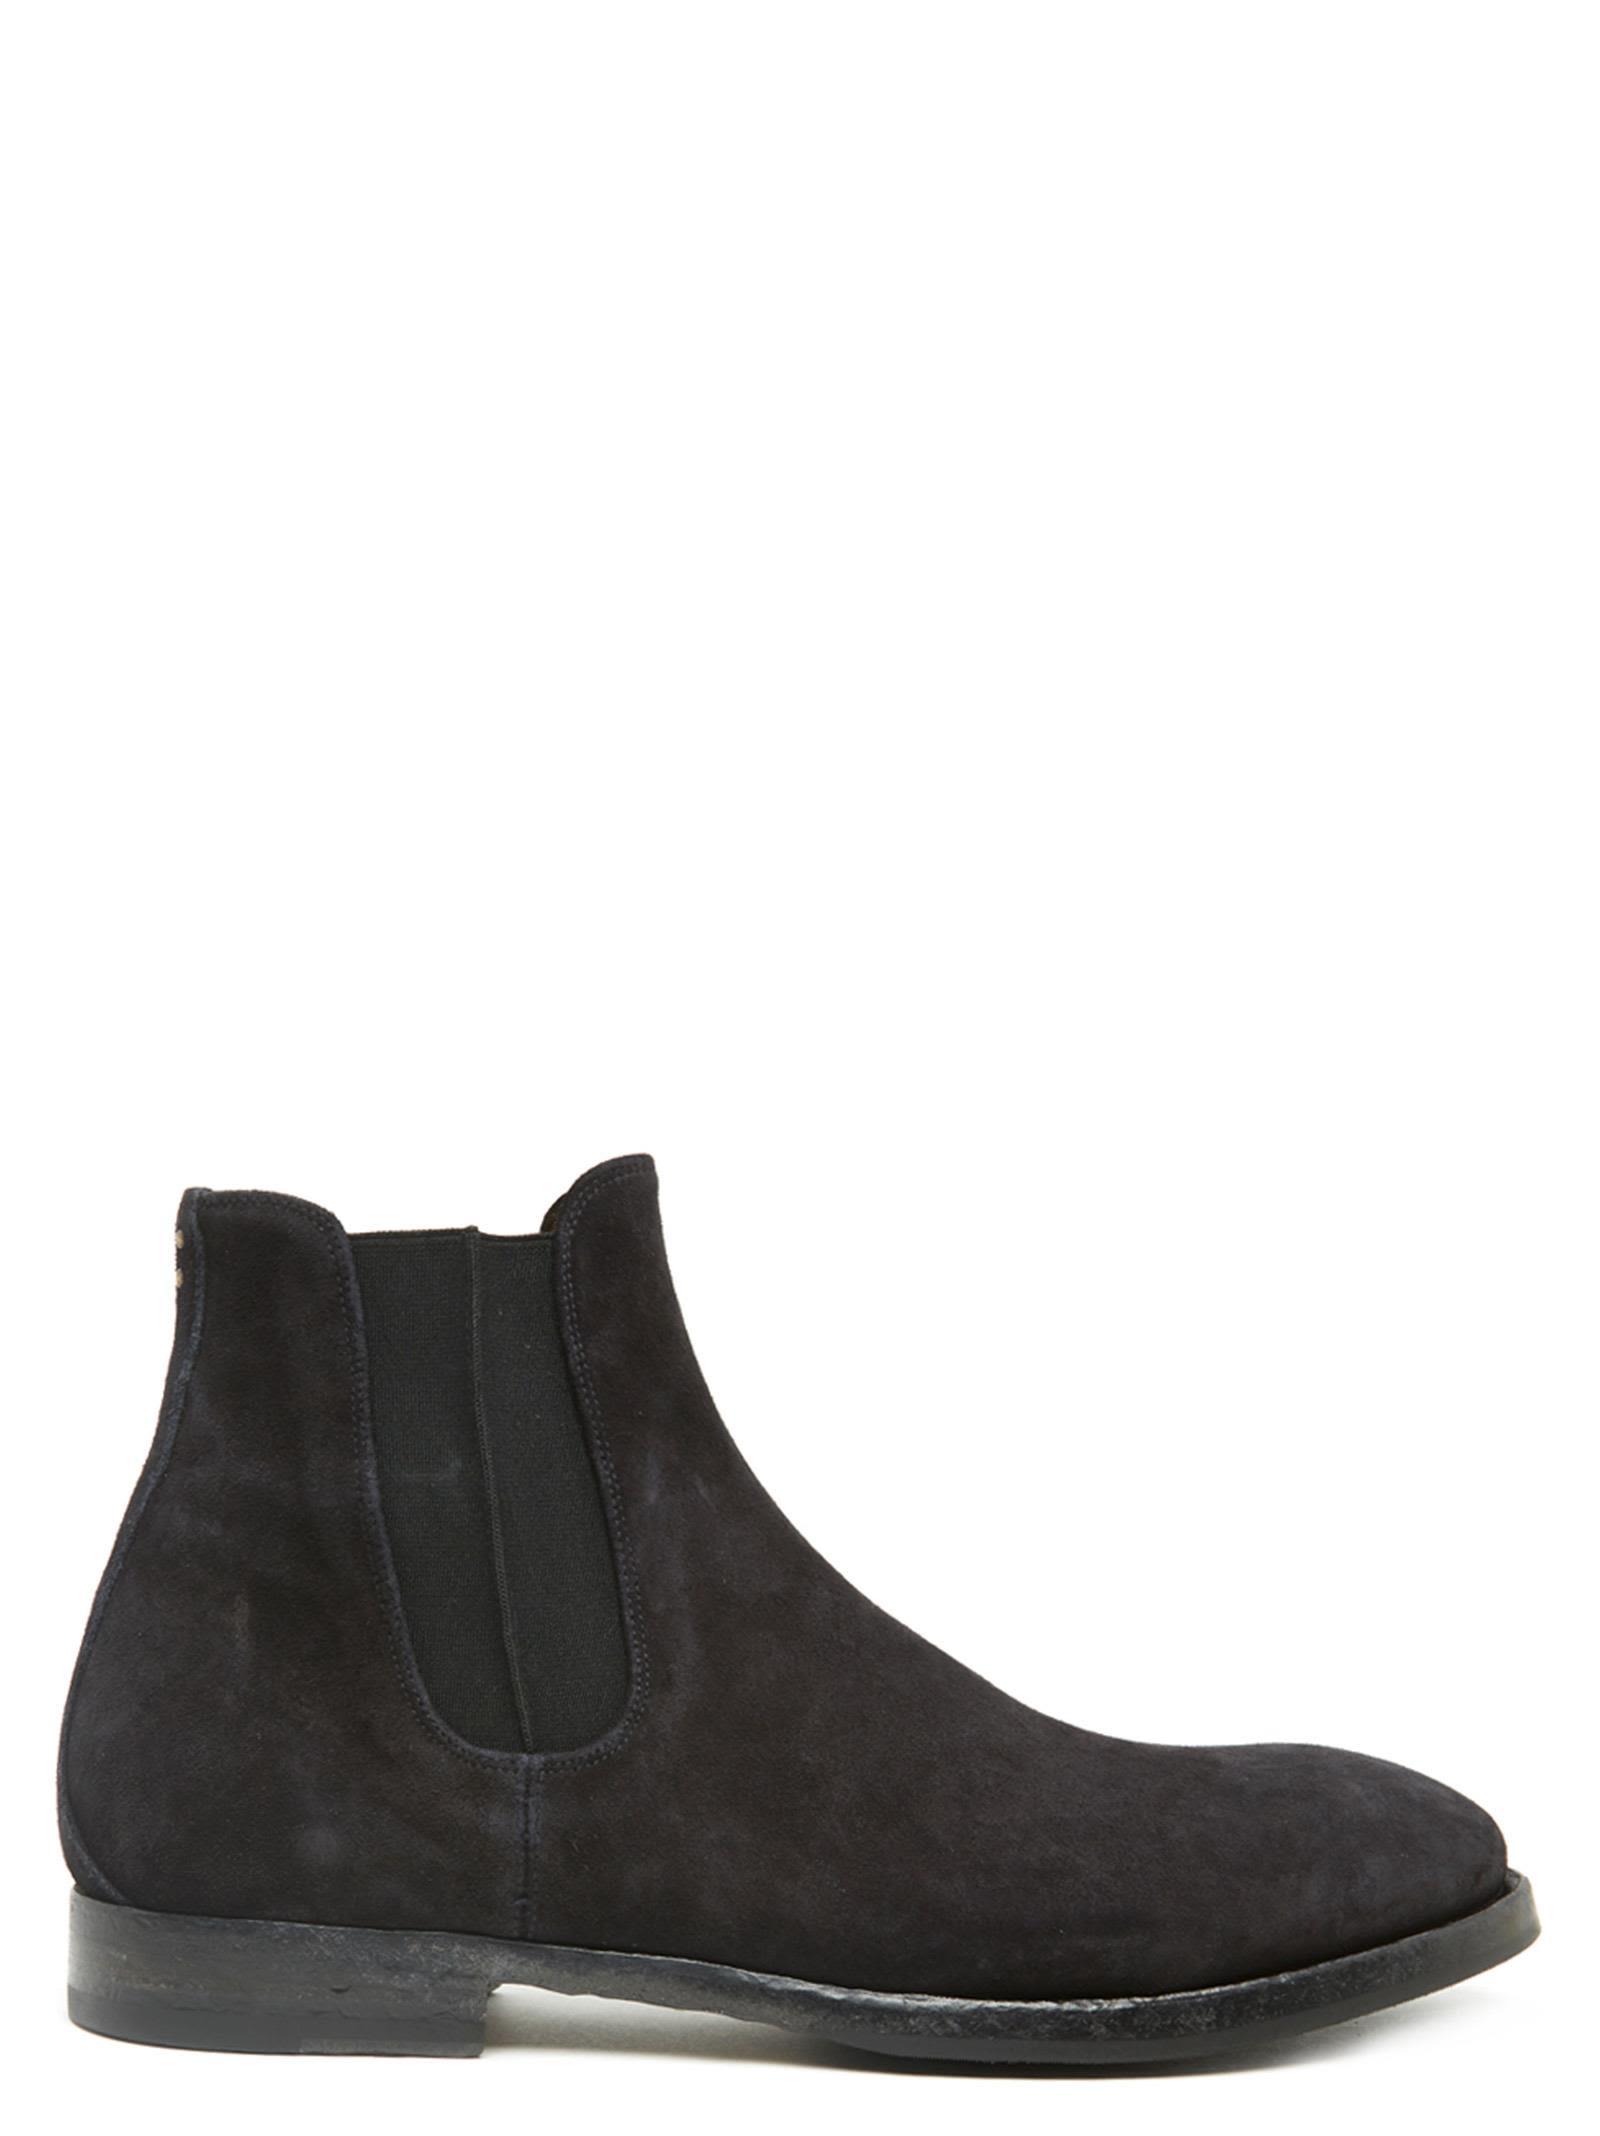 Silvano Sassetti 'diana' Shoes